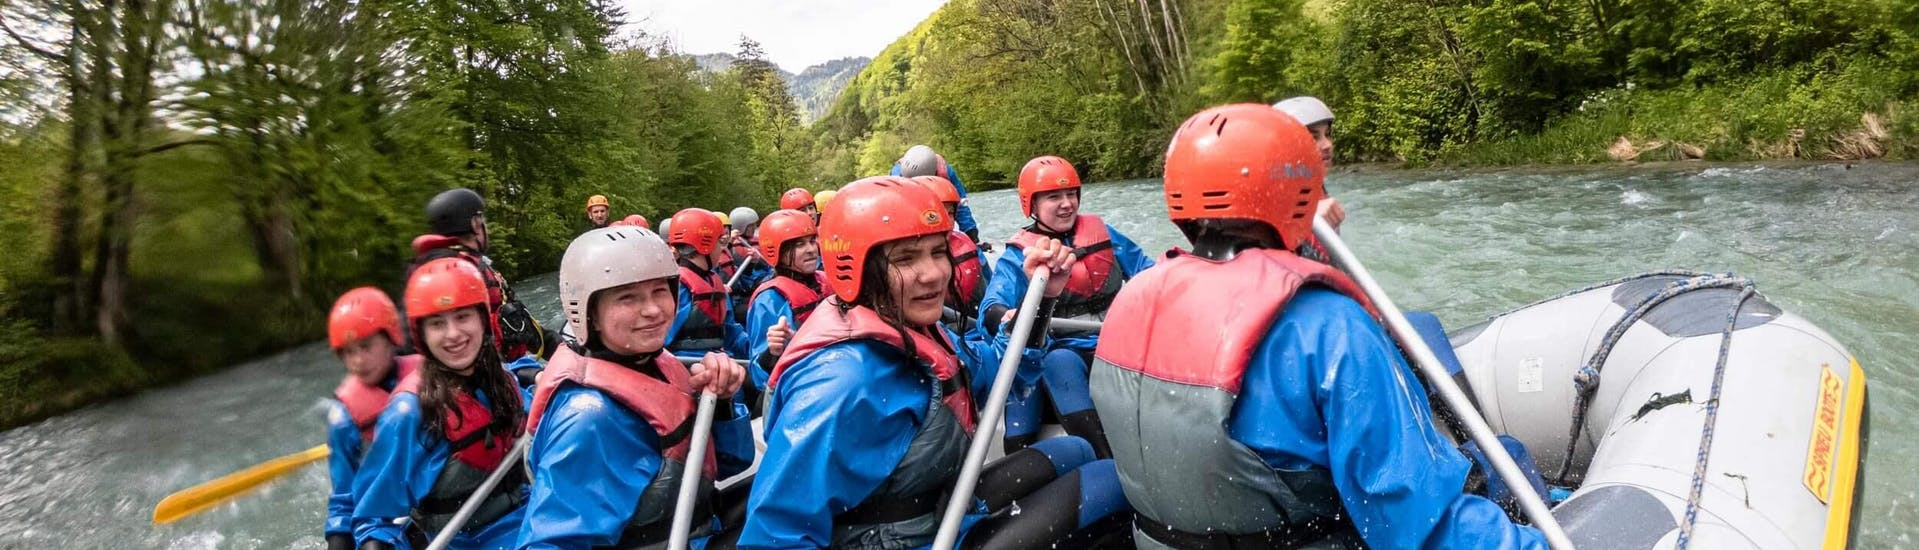 rafting-fun-erlebnistour---berchtesgadener-ache-re-t-berchtesgaden-hero